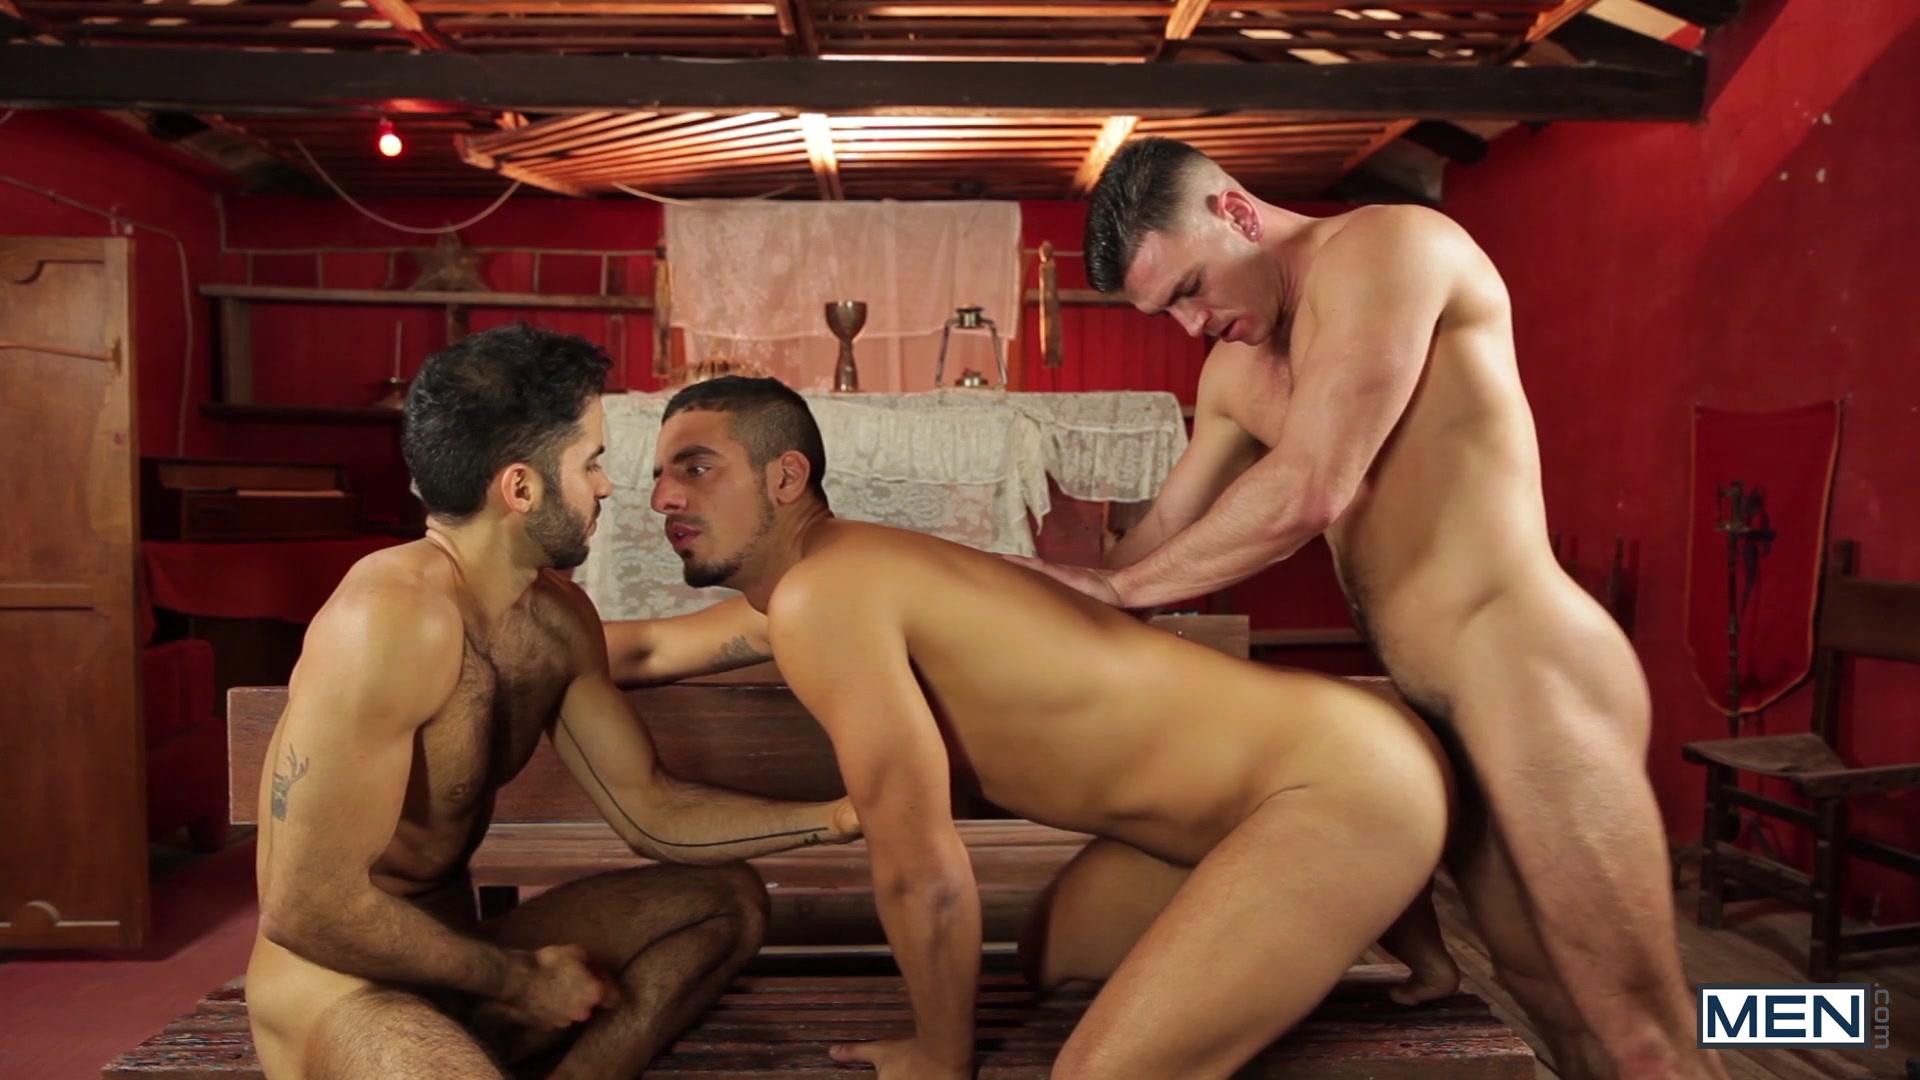 Nino Bacci Porno nino bacci and brandon warner » jocks studios » gay porn